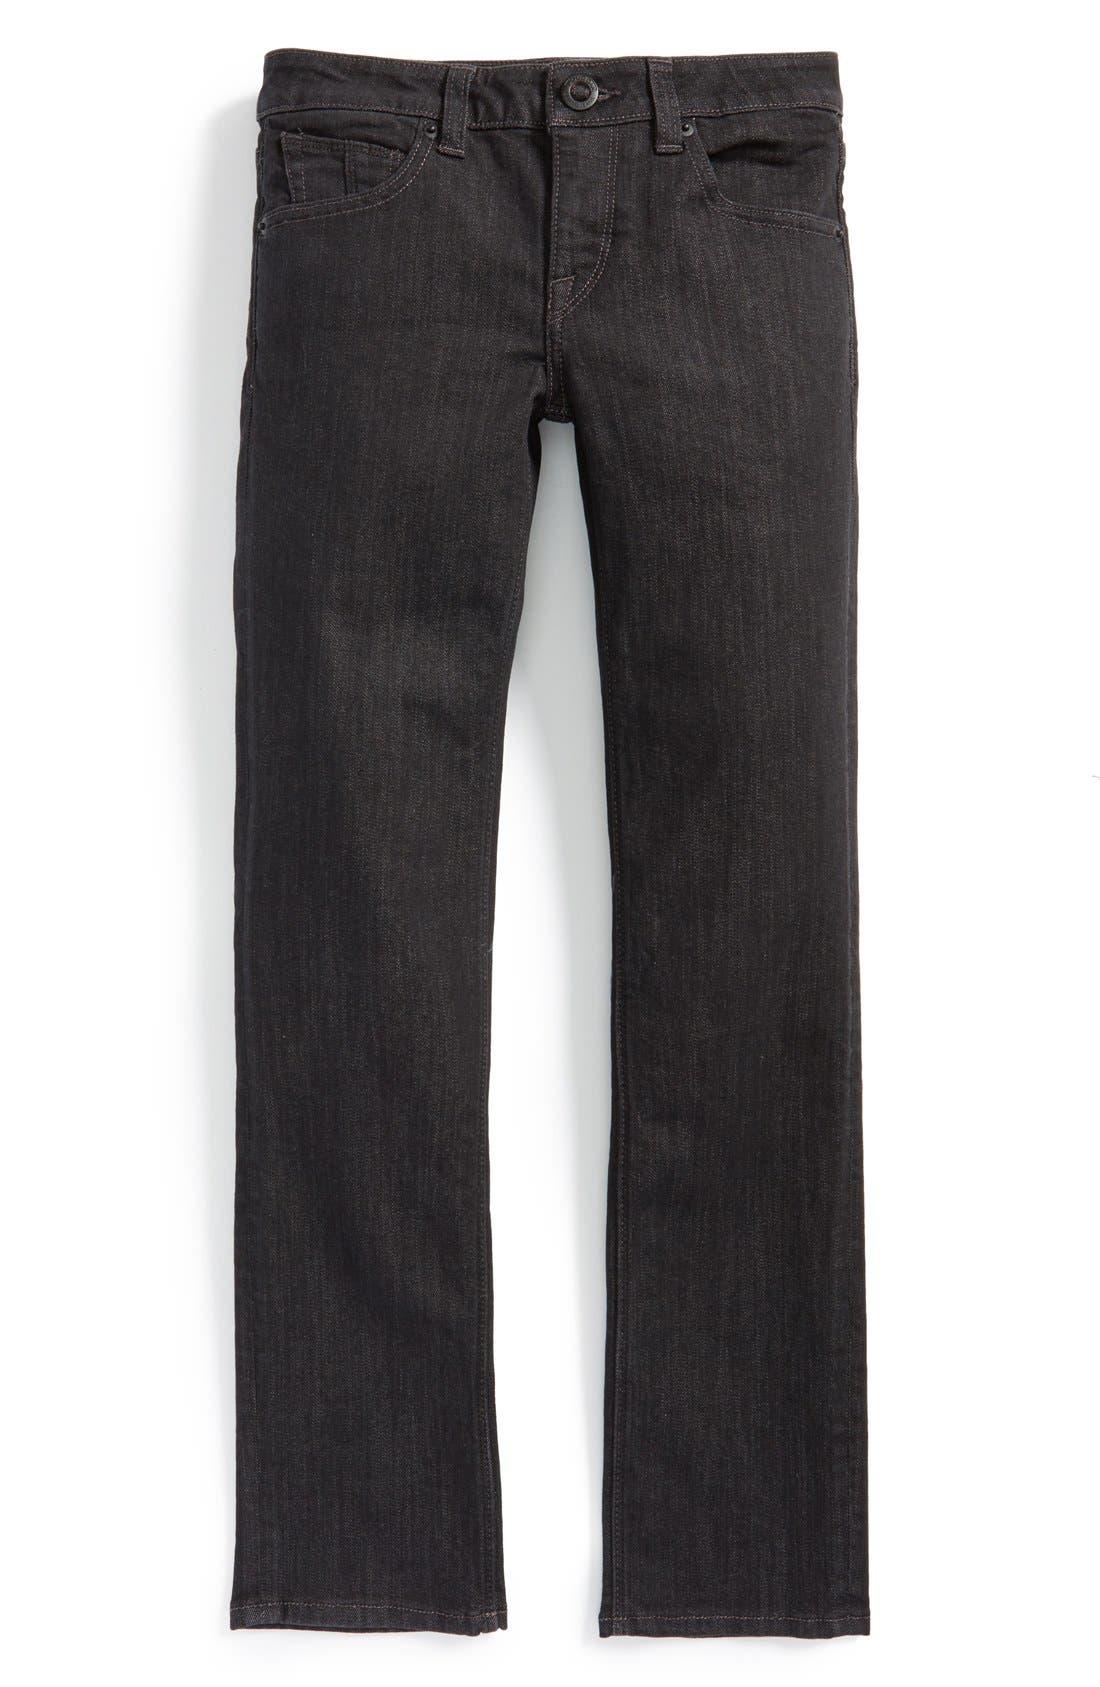 Volcom 'Vorta' Slim Fit Jeans (Toddler Boys & Little Boys)